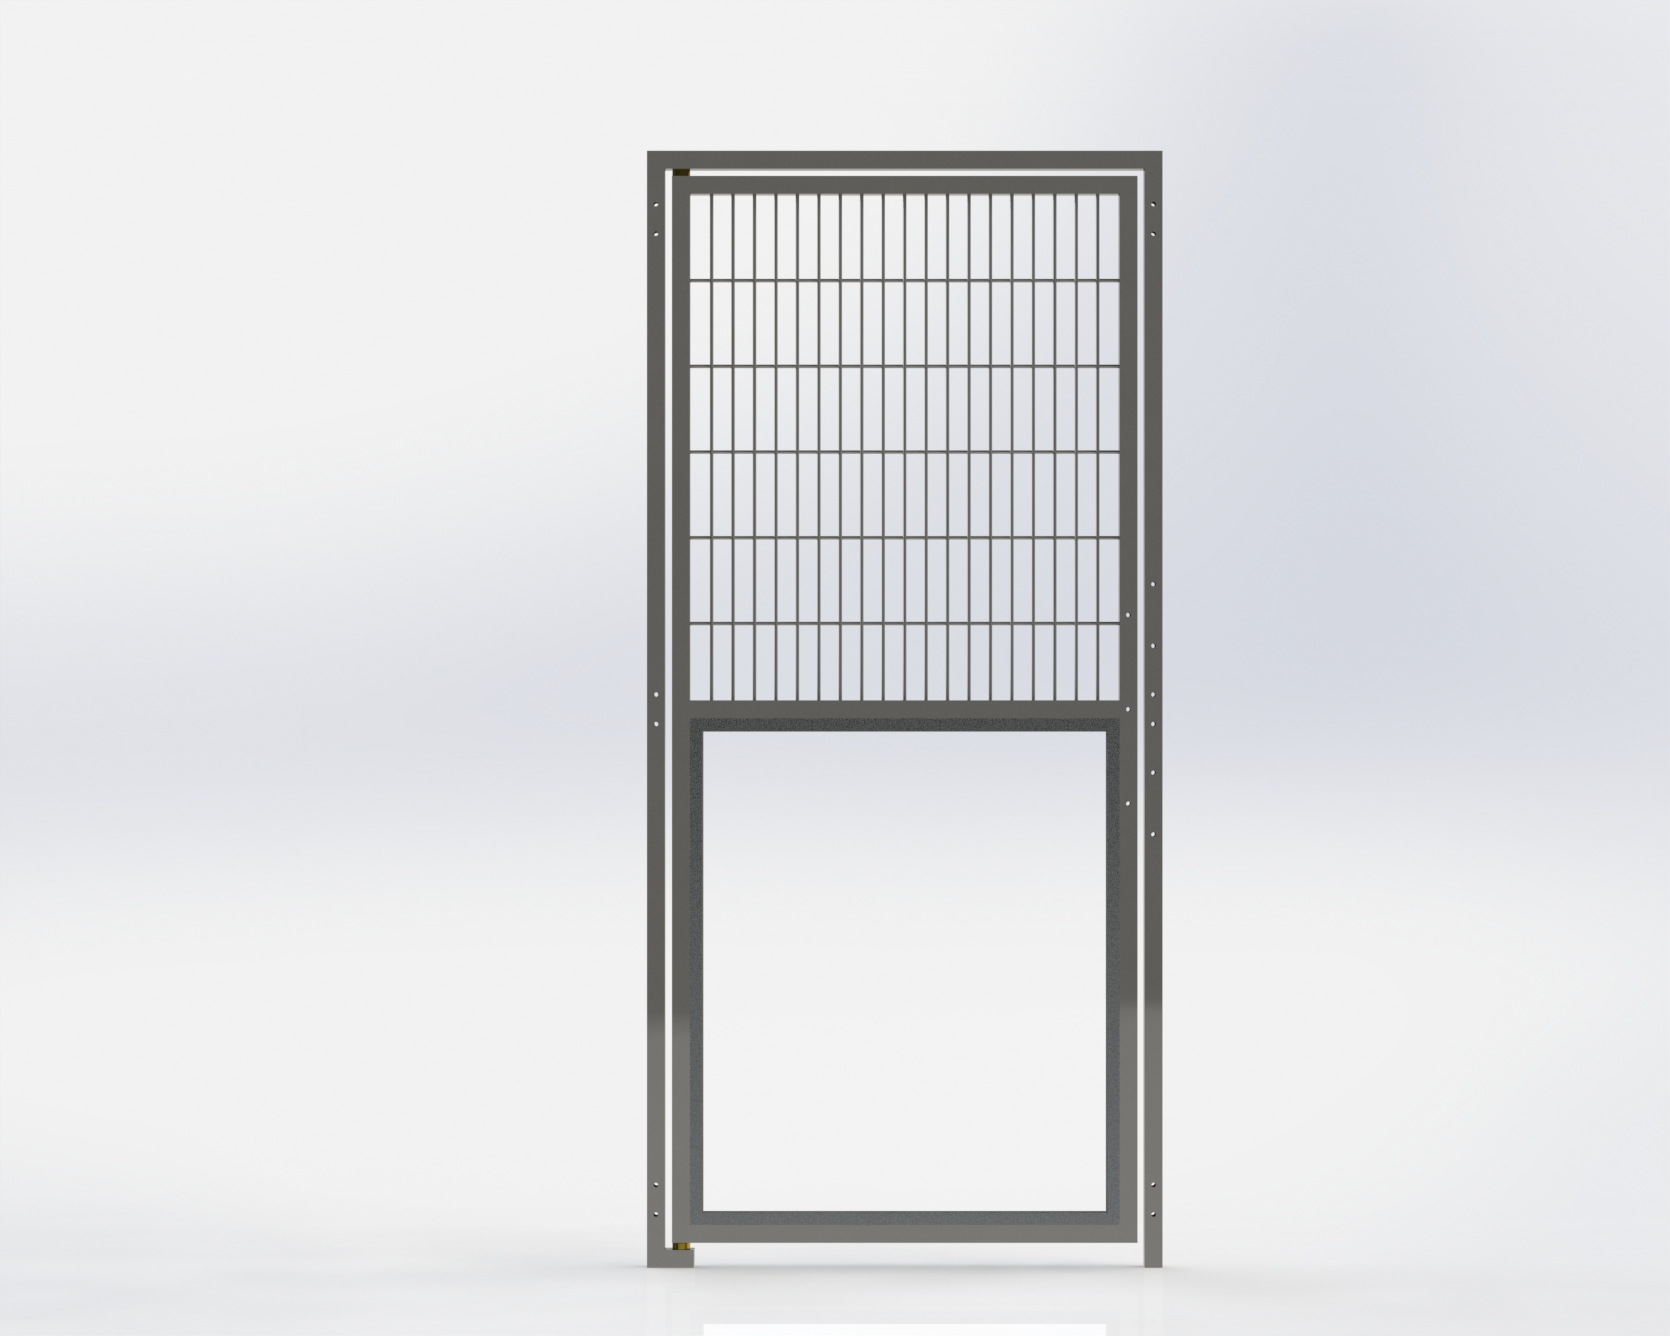 Run Gate,Lower Glass,762mm Wide x1981.2mm High,Right Hand